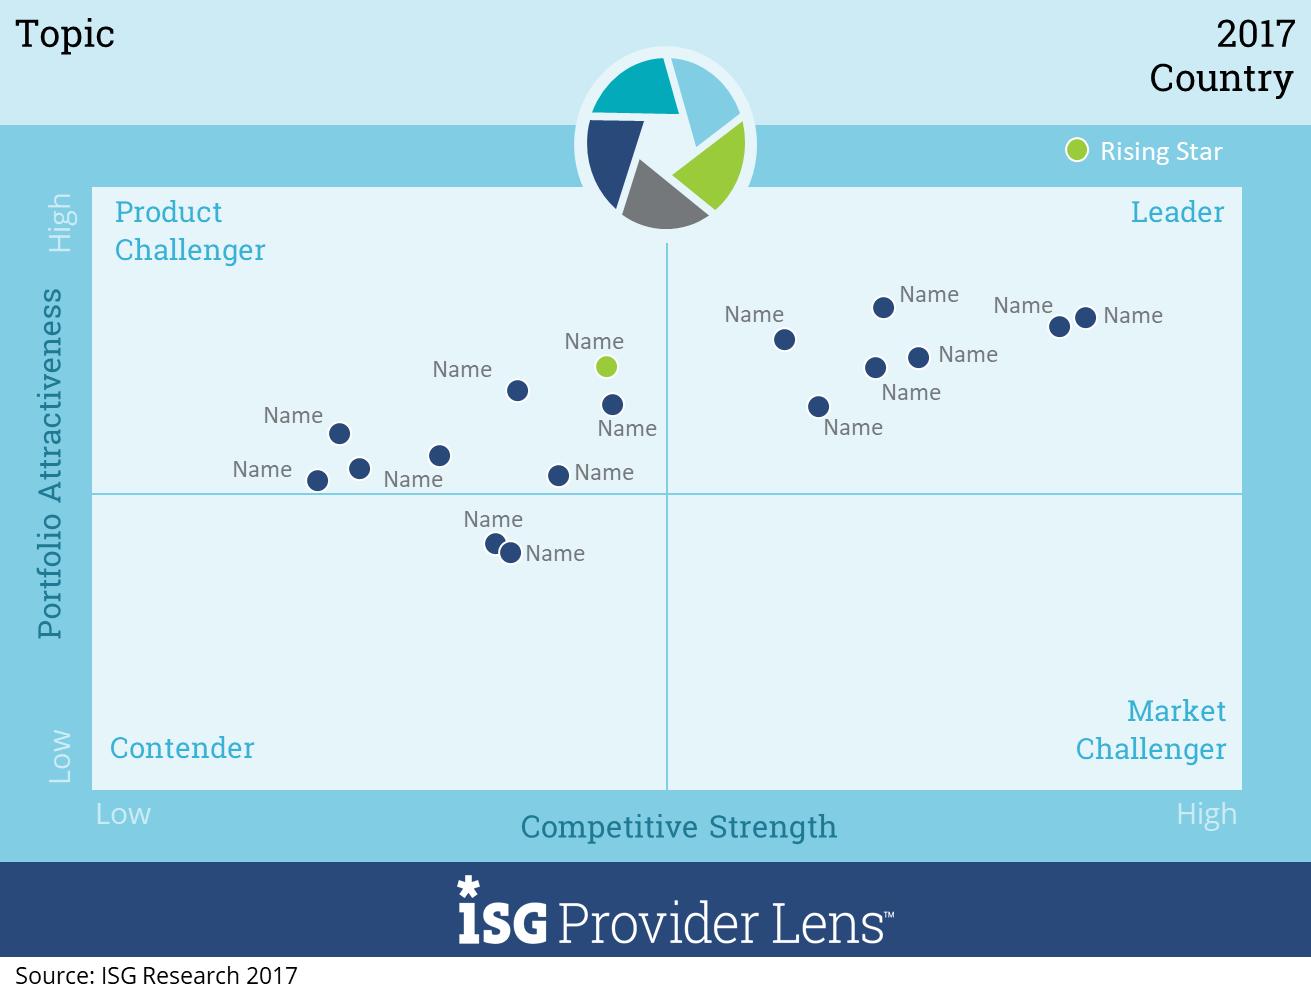 isg provider lens u2122 study  u2013 next